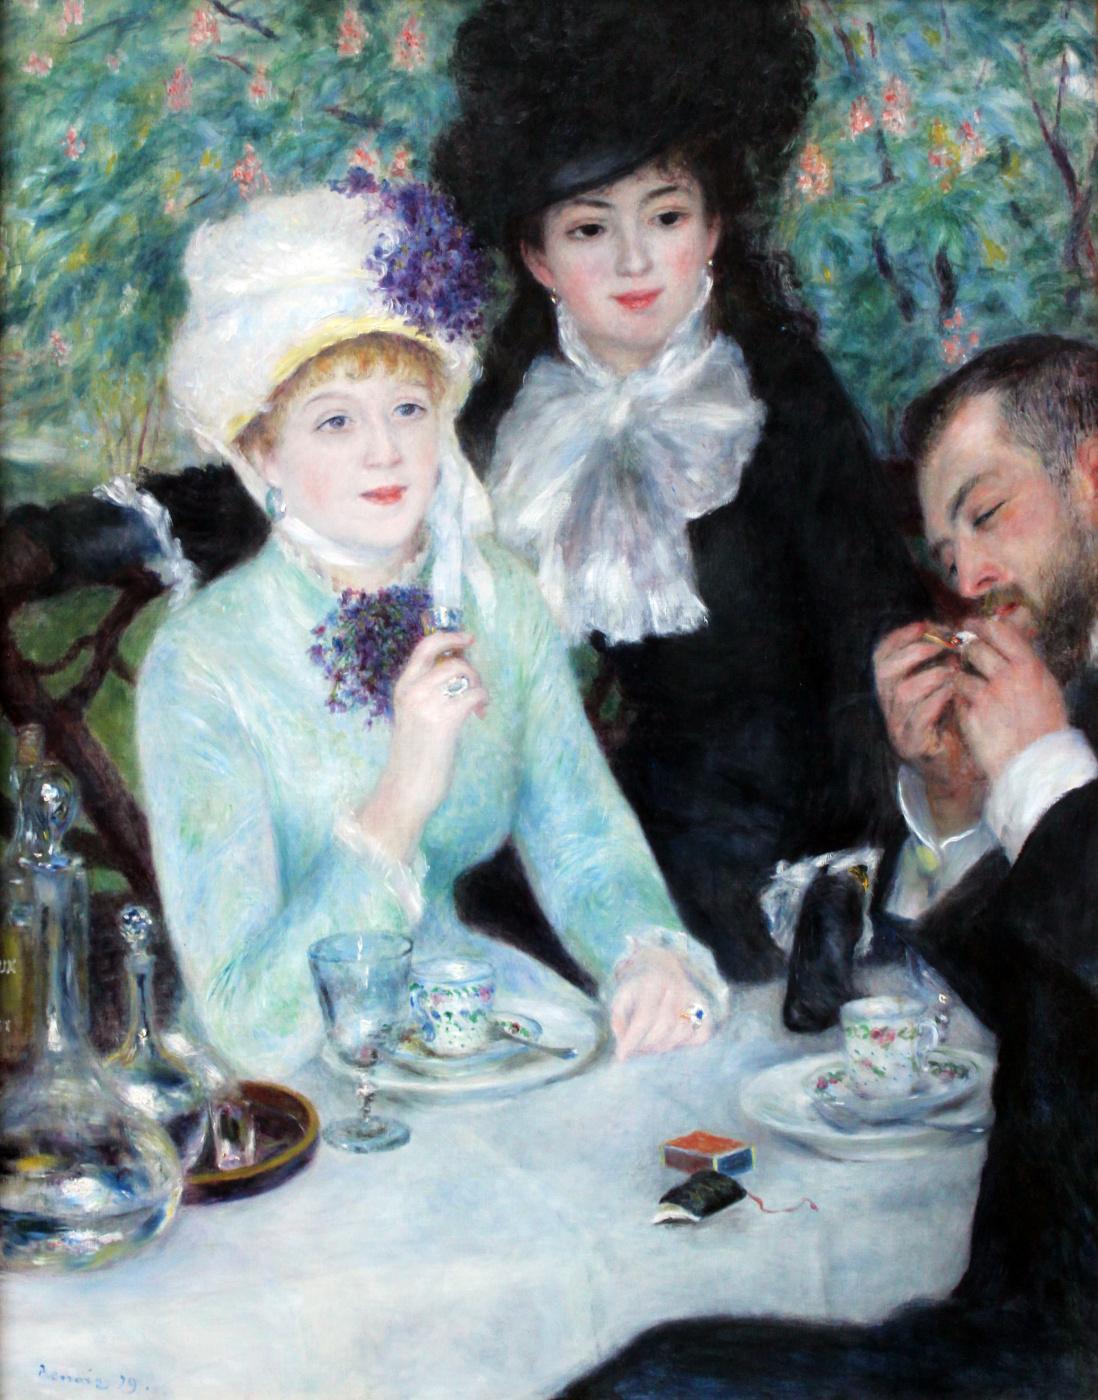 Pierre-Auguste Renoir. After Breakfast